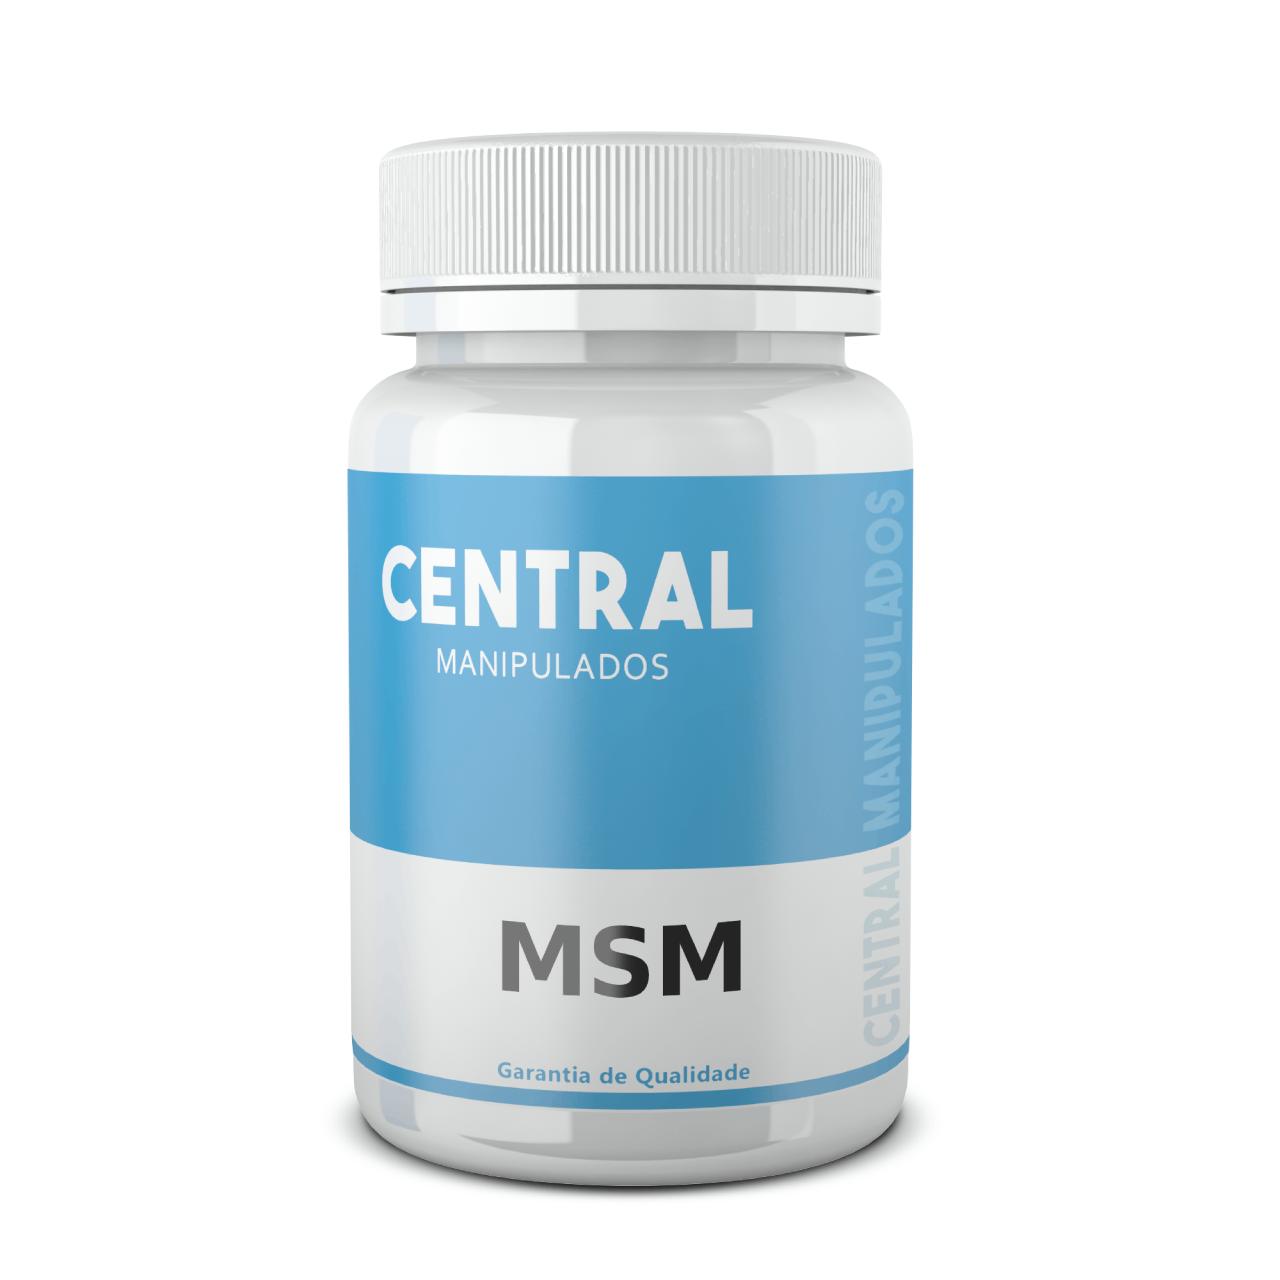 Metil Sulfonil Metano (MSM) 500mg - 120 cápsulas - Forma Natural do Enxofre Orgânico